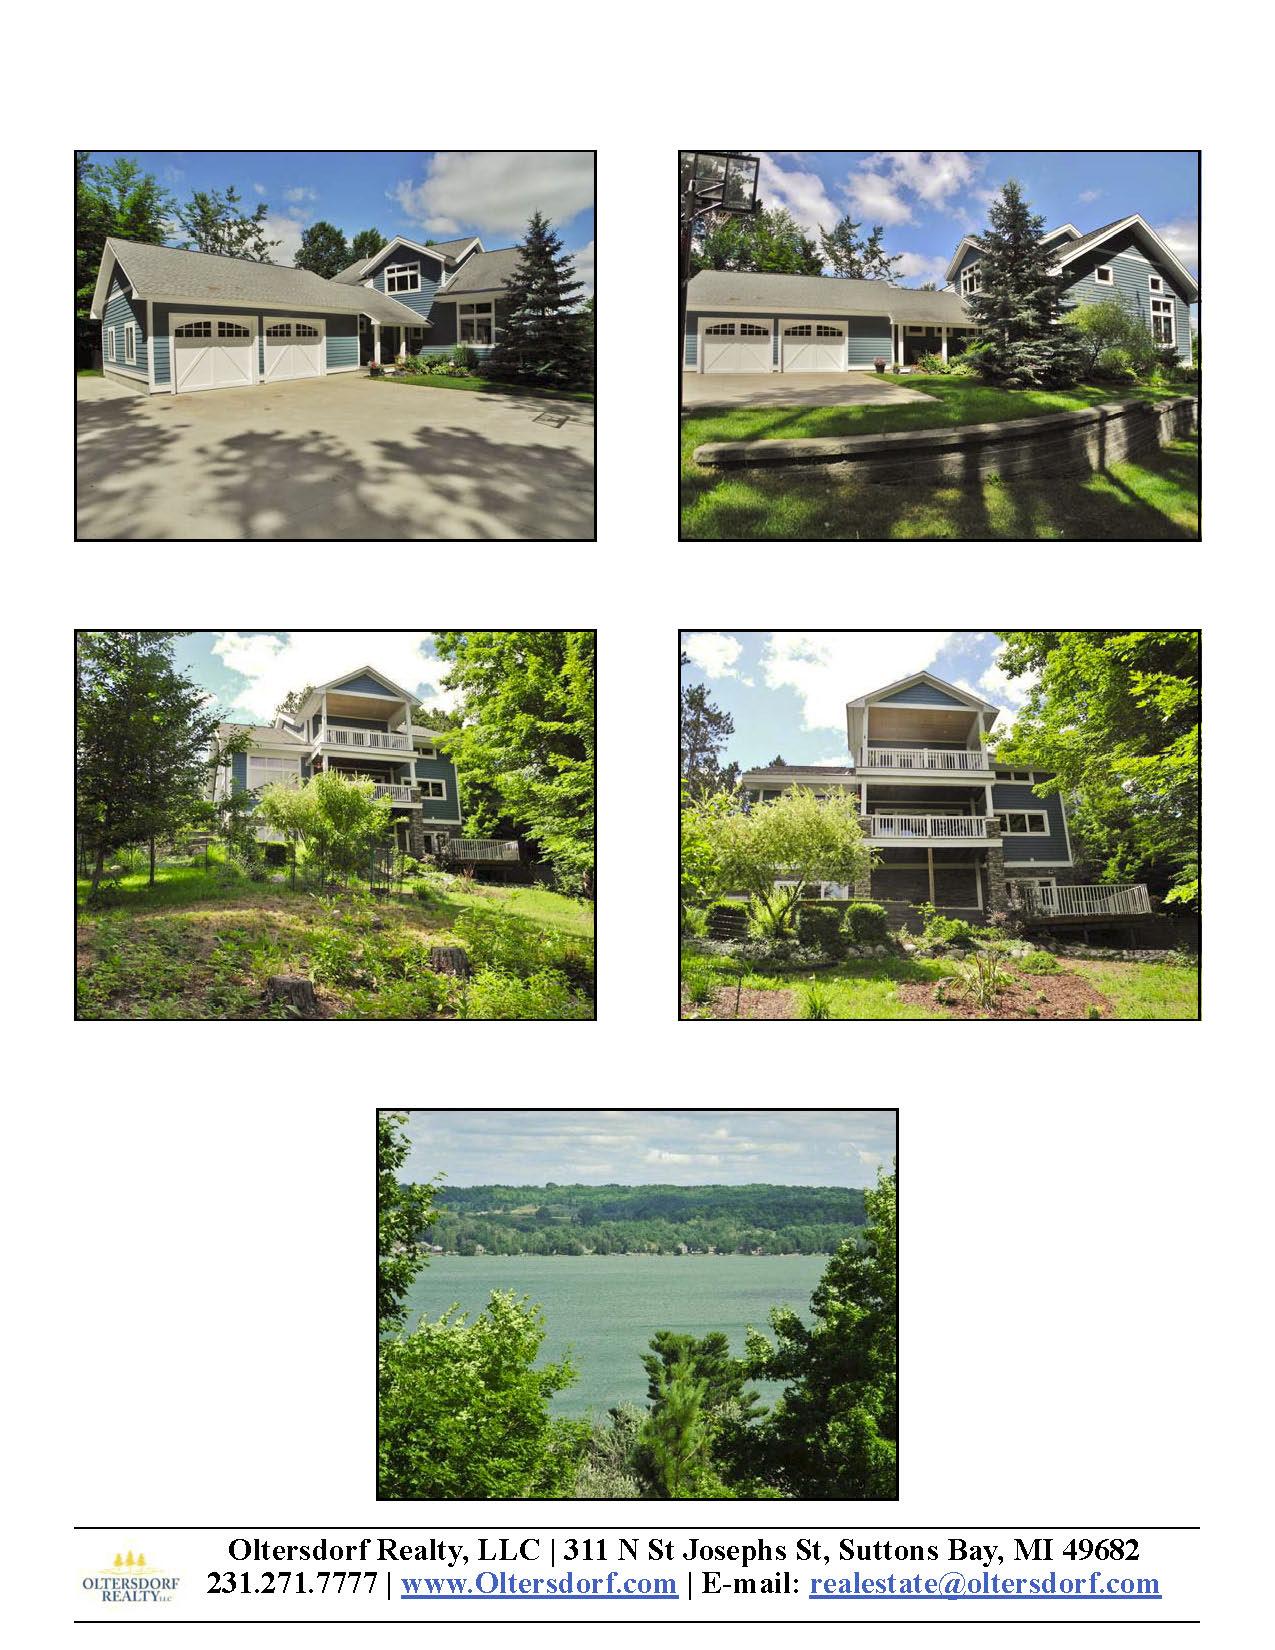 5500 E Hidden Beech, Cedar, MI - For sale by Oltersdorf Realty LLC - Marketing Packet (2).jpg